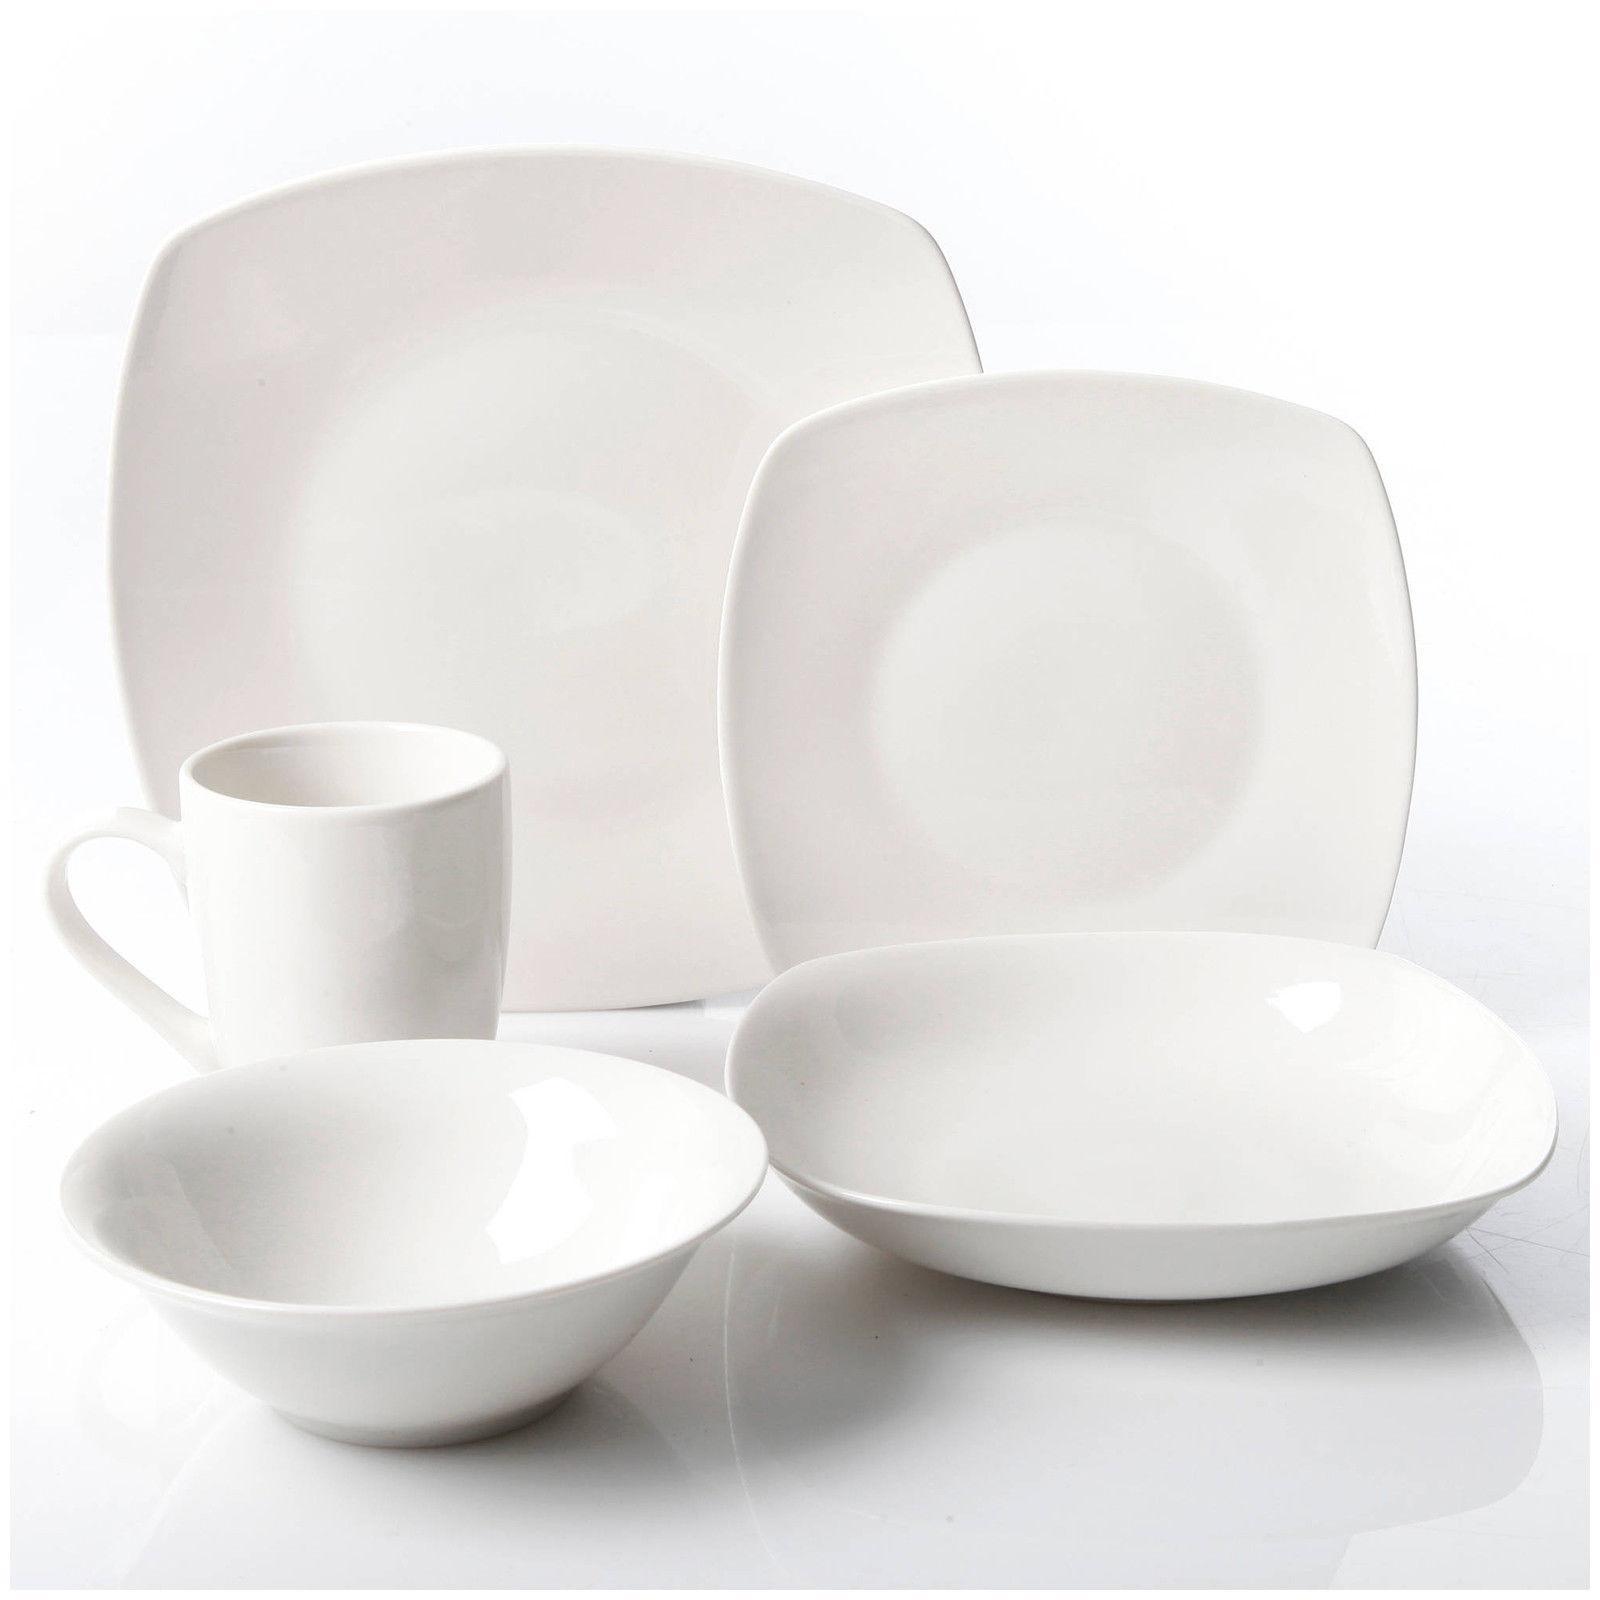 Porcelain Dinnerware 6 30Pc Kitchen Bowls